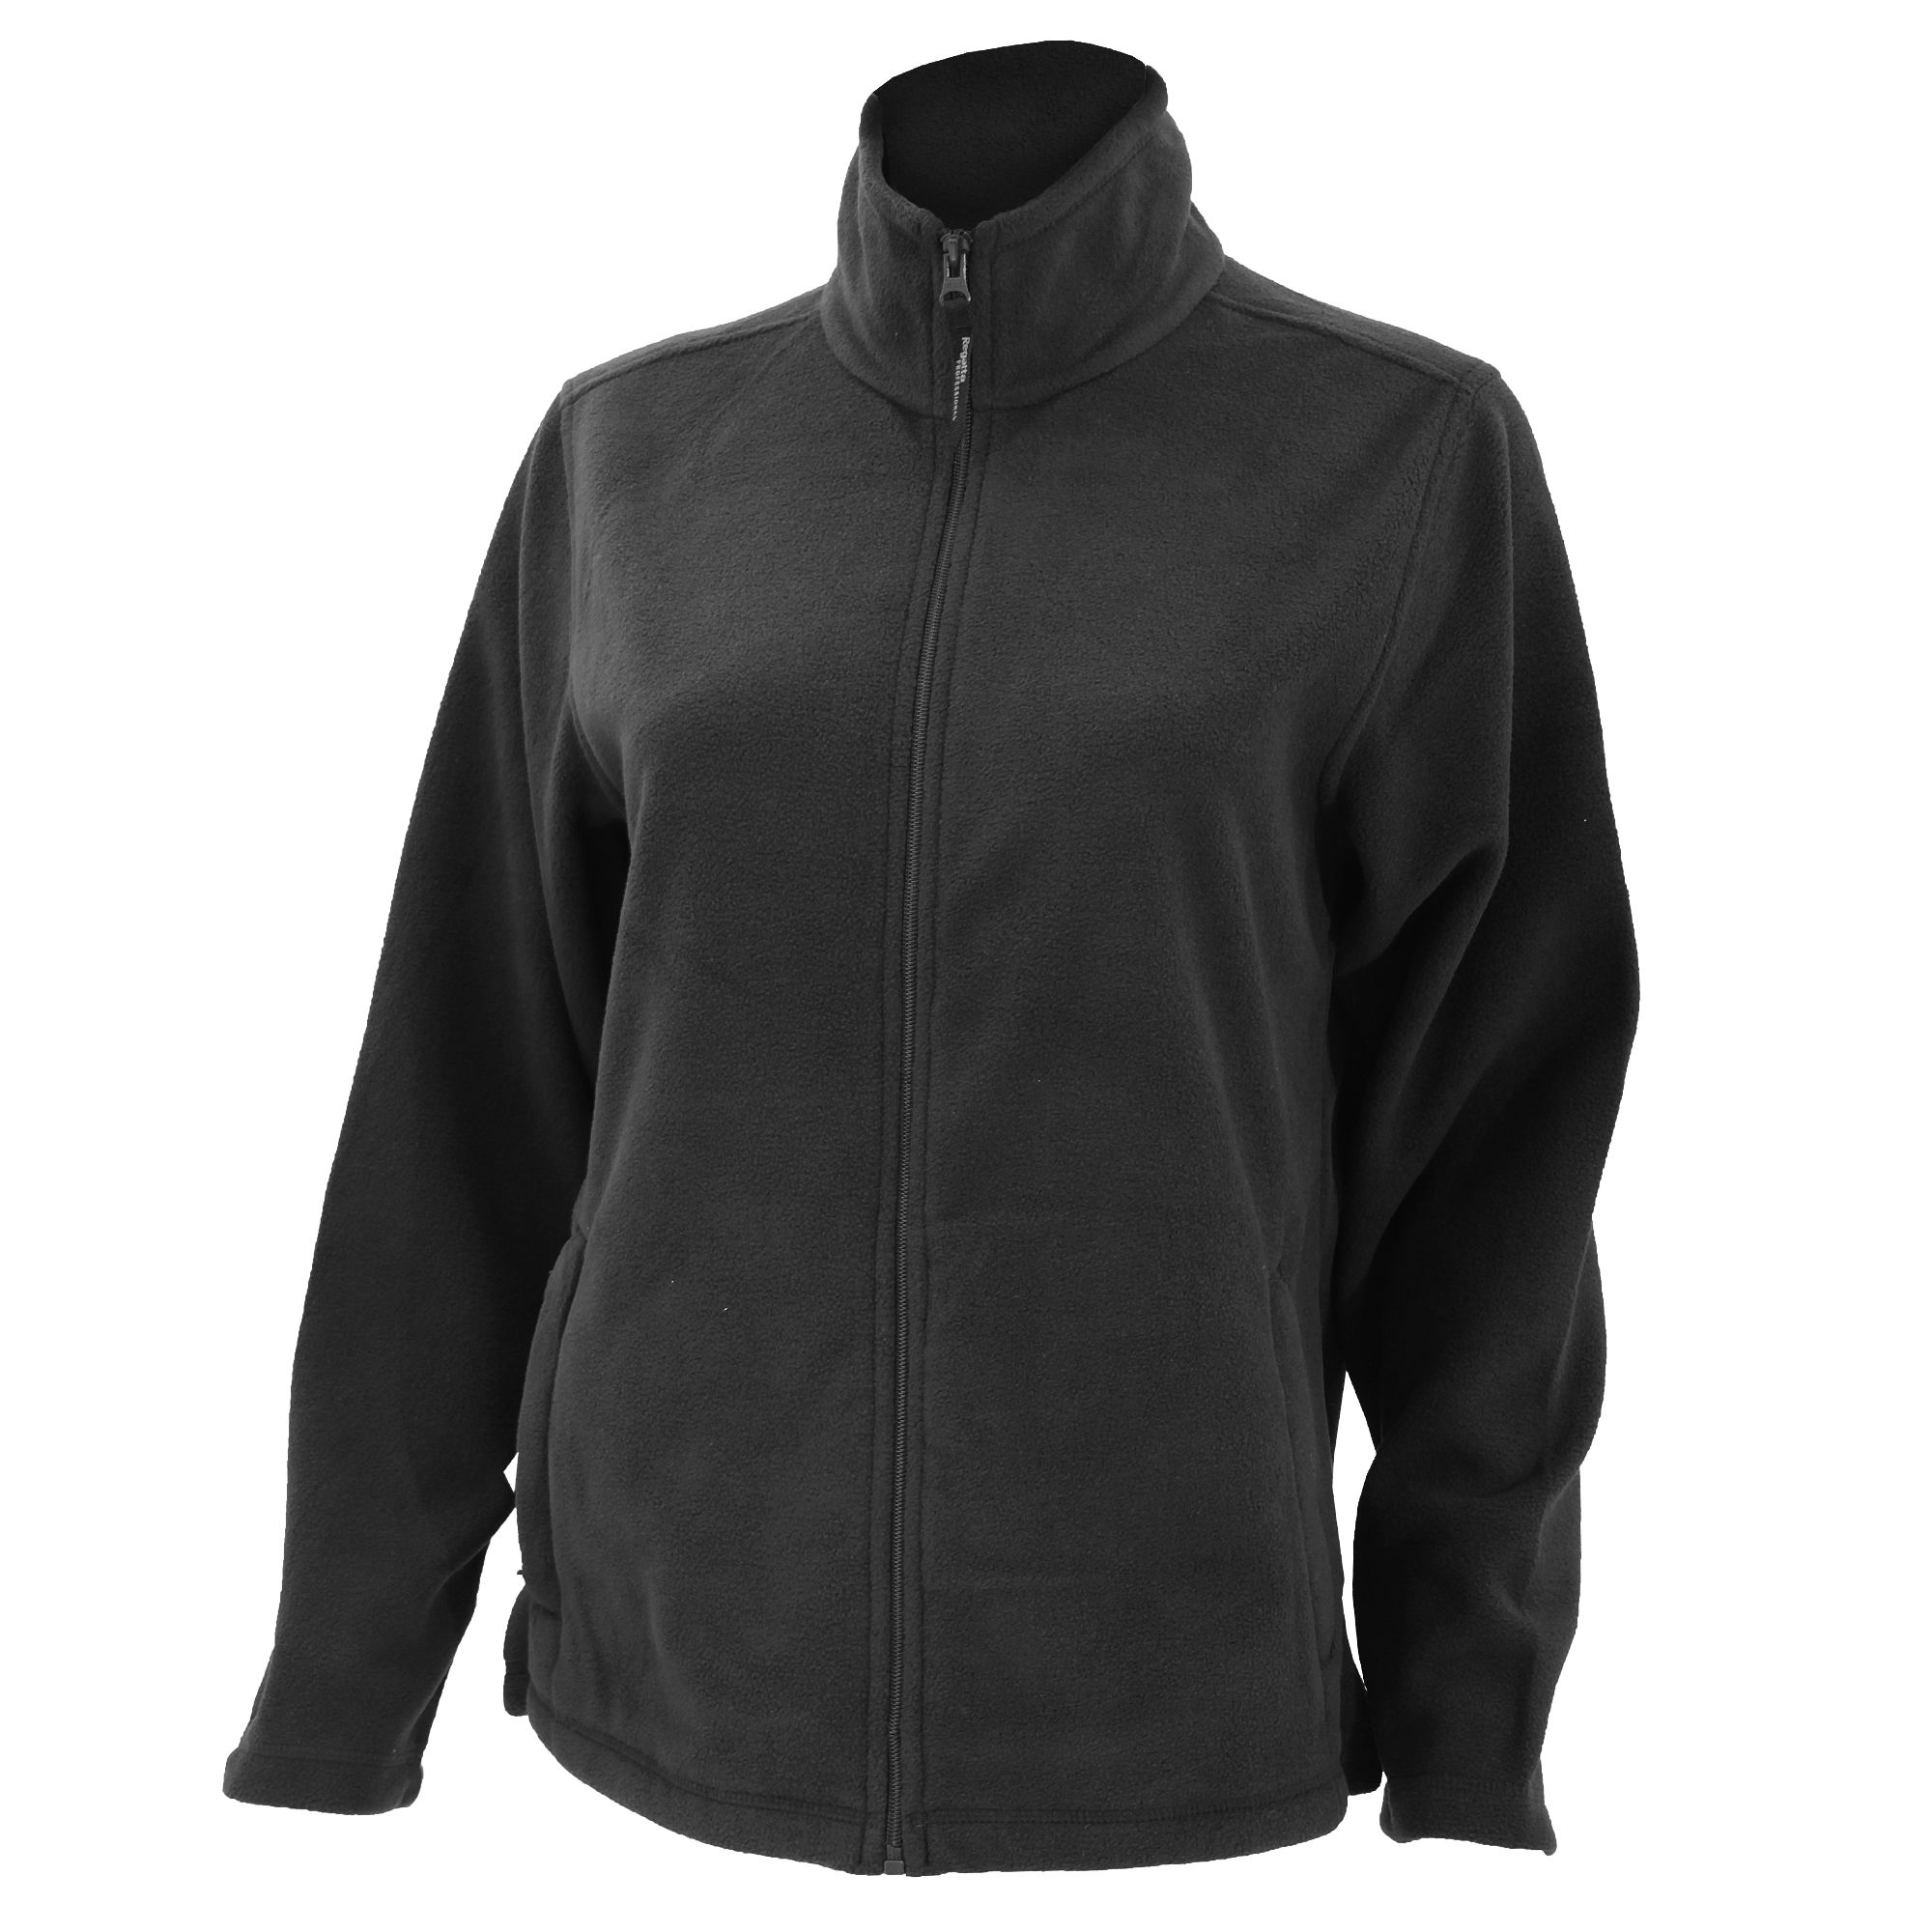 Regatta Womens/Ladies Full-Zip 210 Series Microfleece Jacket